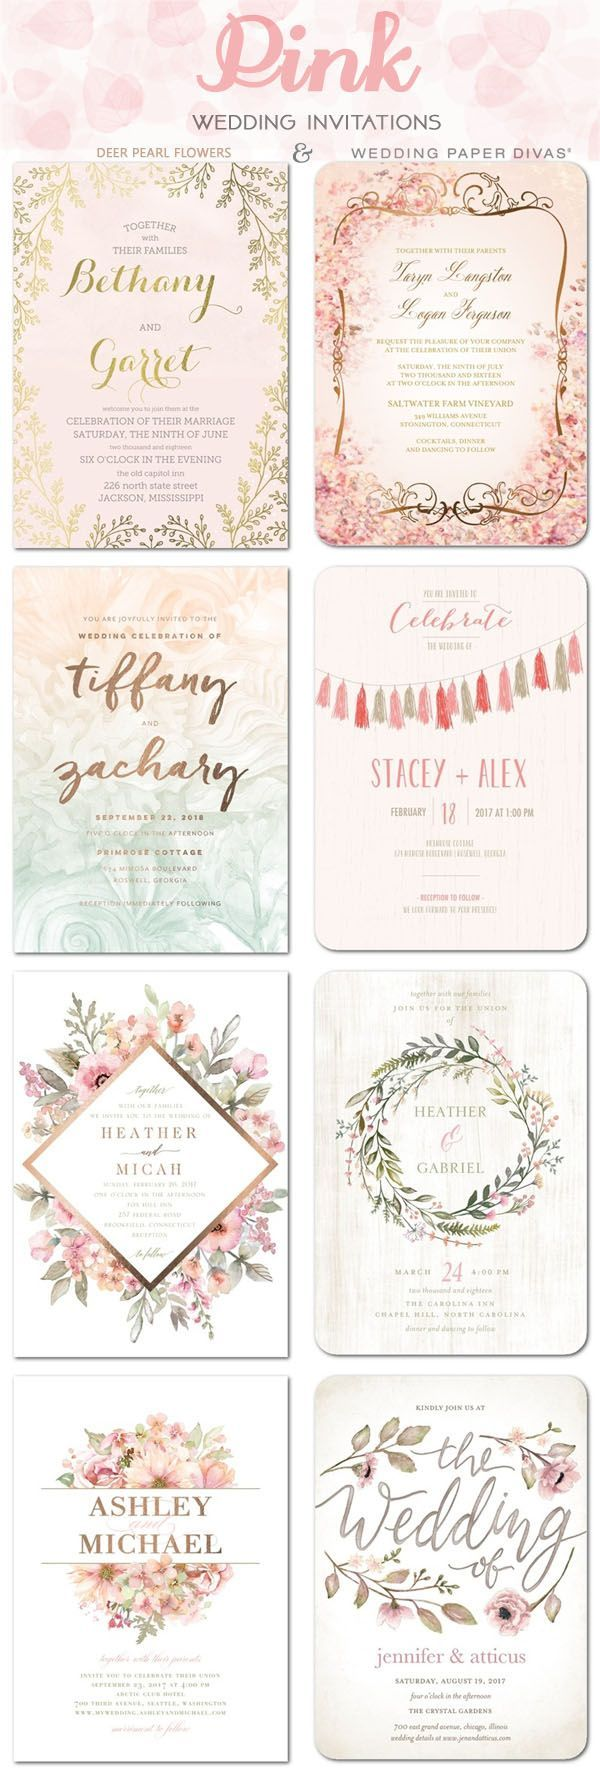 127 Best Wedding Invitations Images On Pinterest Wedding Stuff